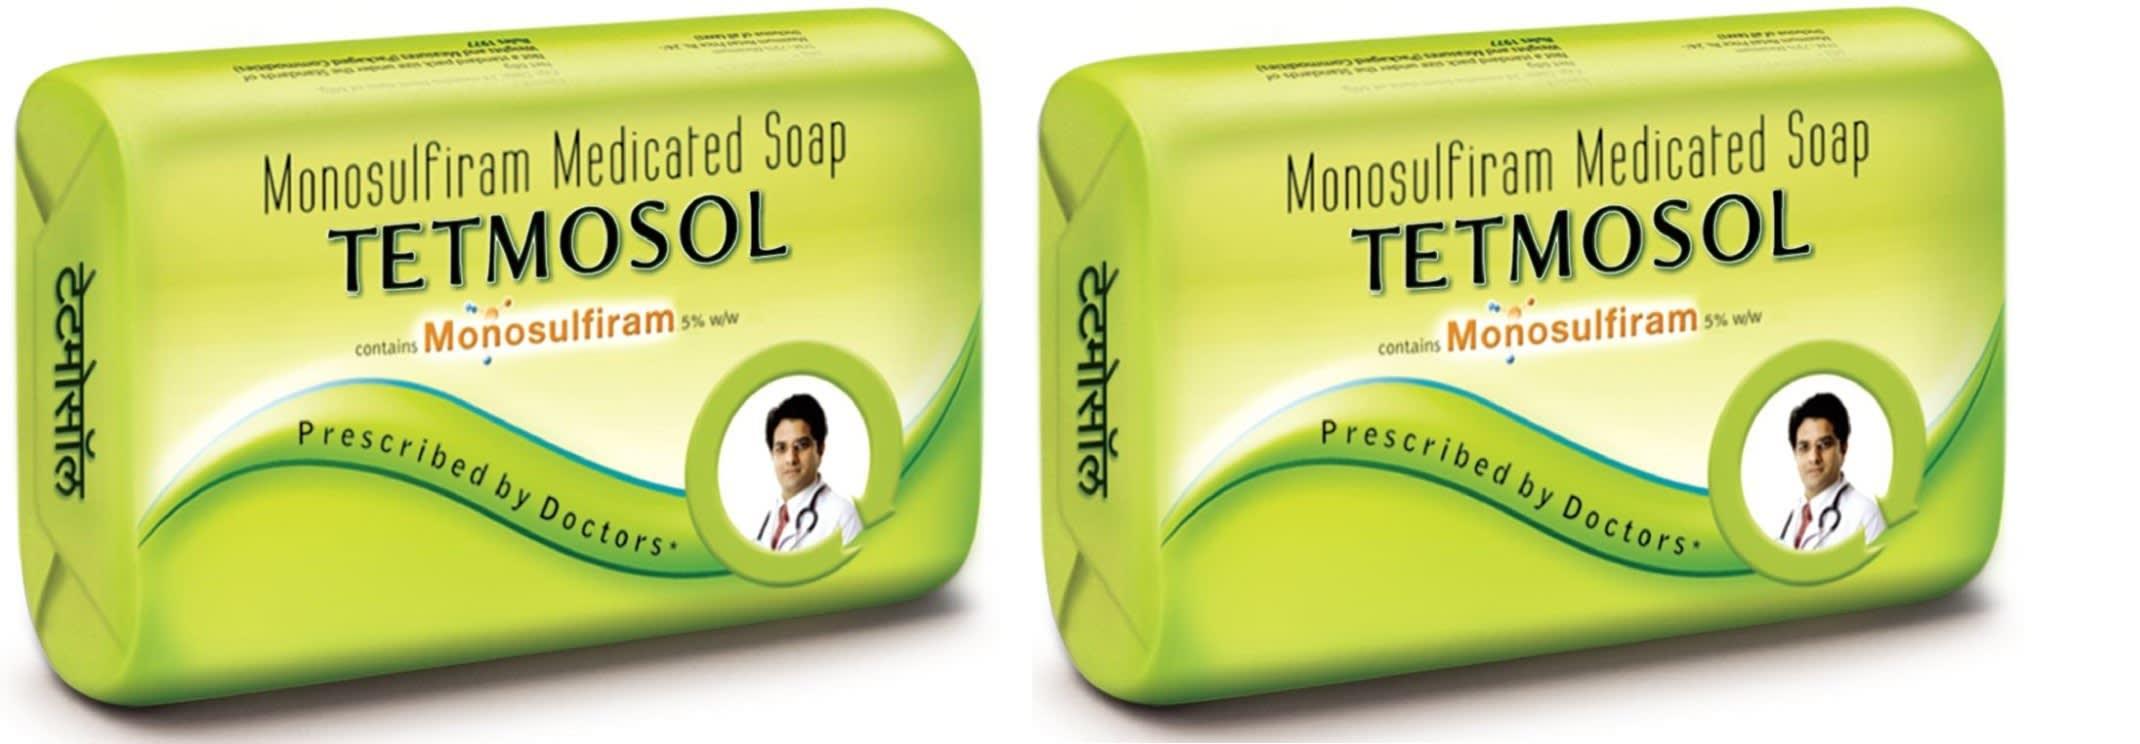 Tetmosol Medicated Soap Pack of 2